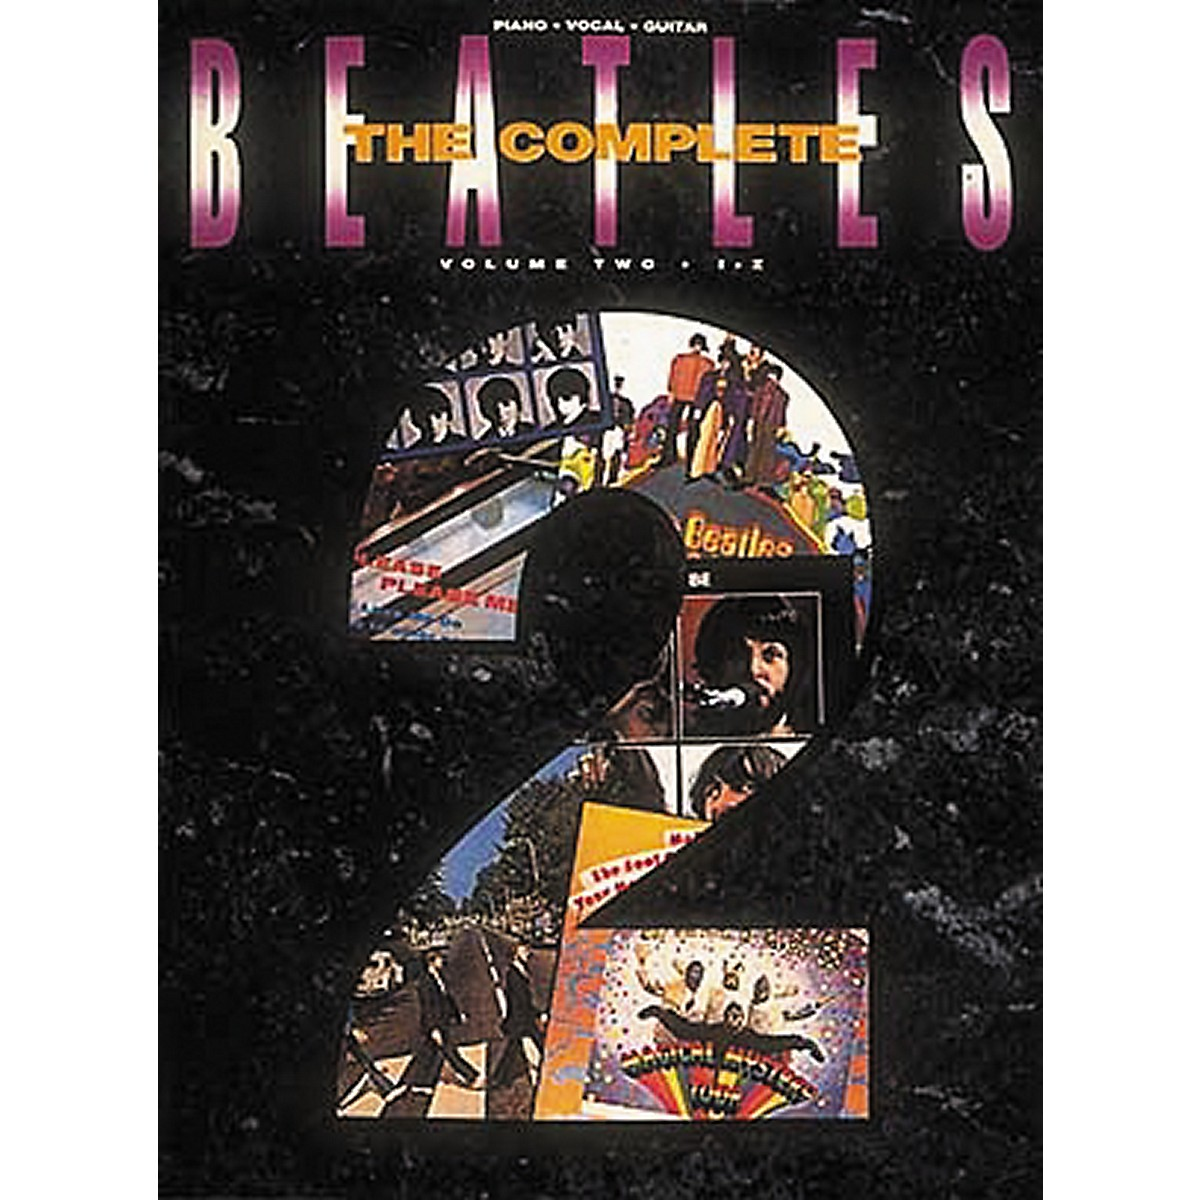 Hal Leonard Complete Beatles Volume 2 Piano, Vocal, Guitar Songbook